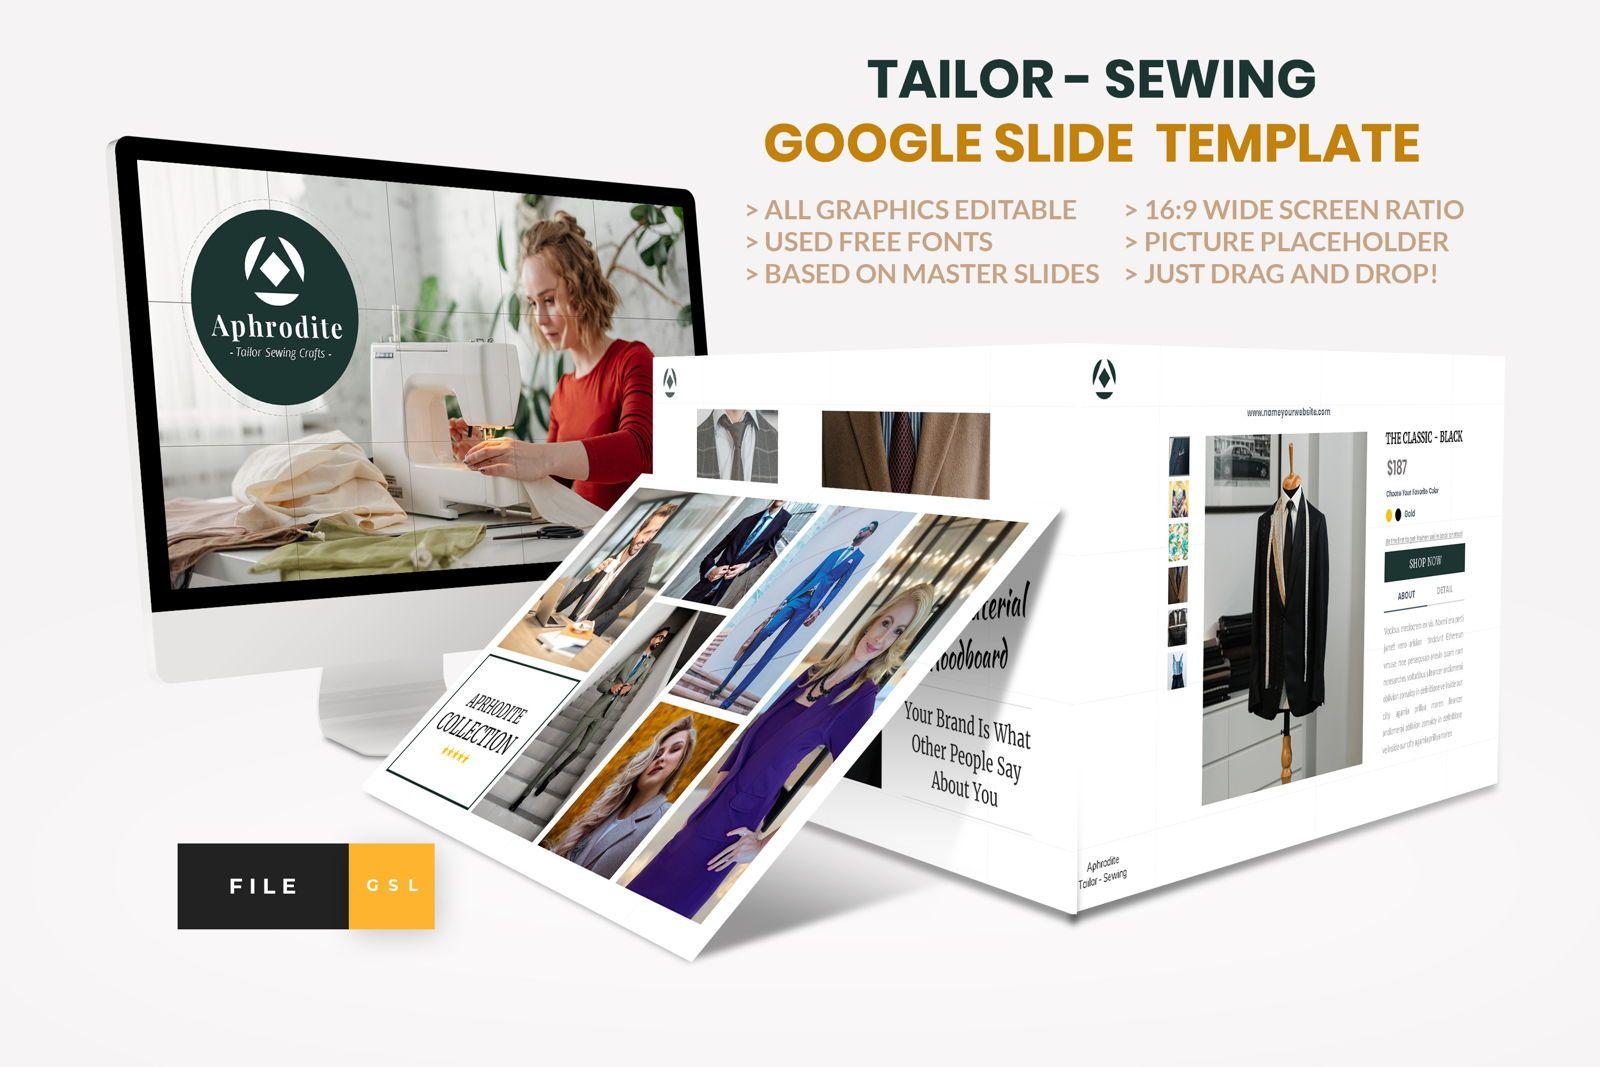 Tailor - Sewing Fashion Craft Google Slide Template, 08621, Business Models — PoweredTemplate.com